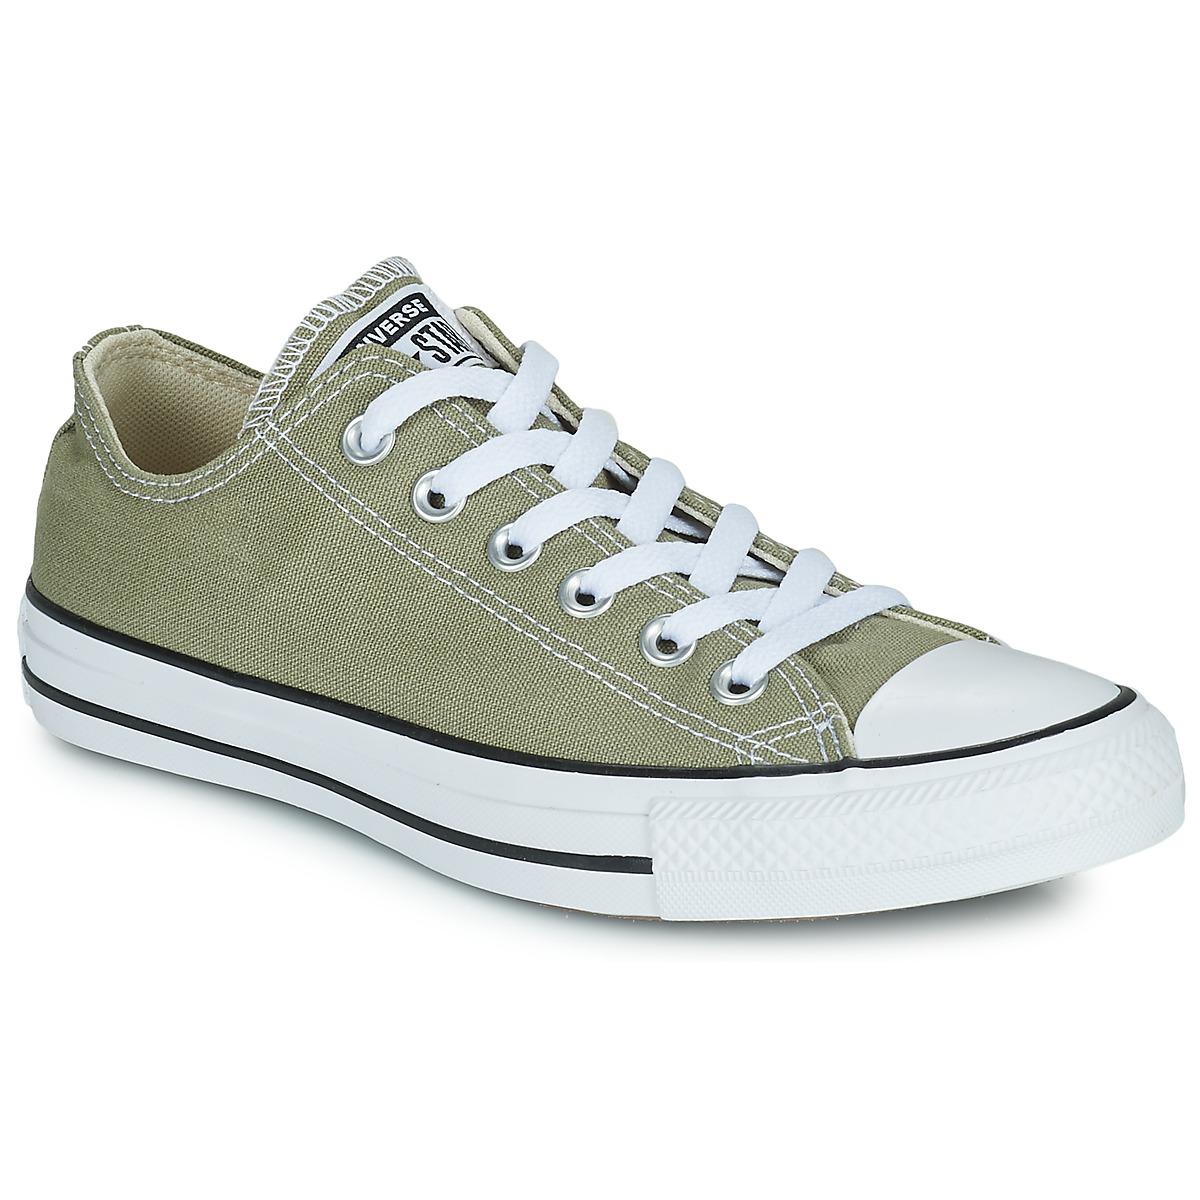 Sneakers uomo Converse CHUCK TAYLOR ALL STAR SEASONAL COLOR OX Beige